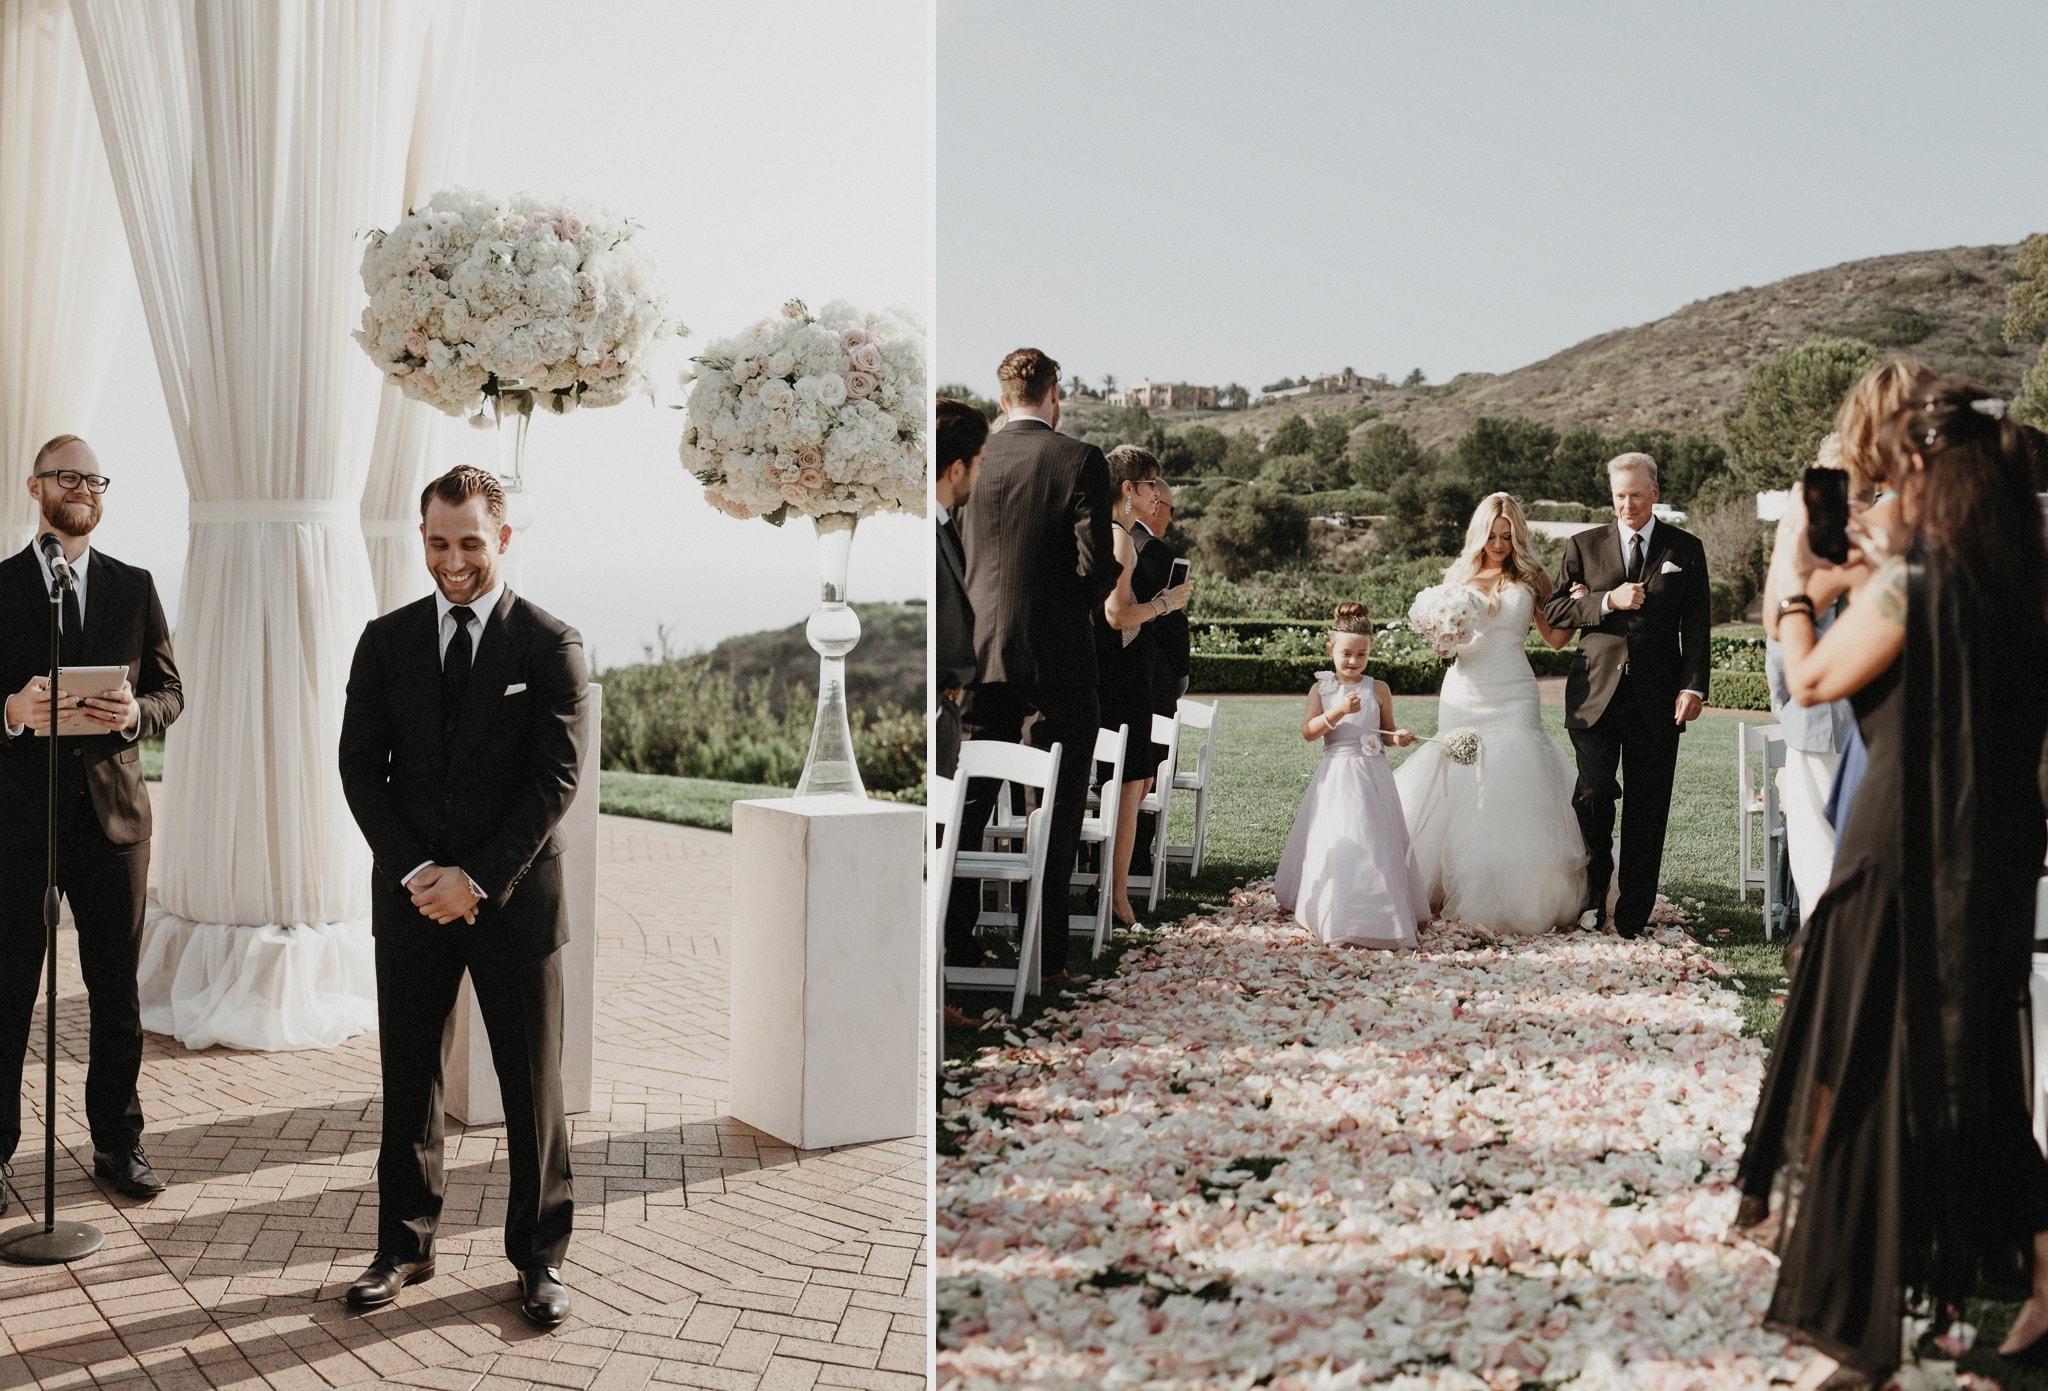 037-california-destination-wedding.jpg